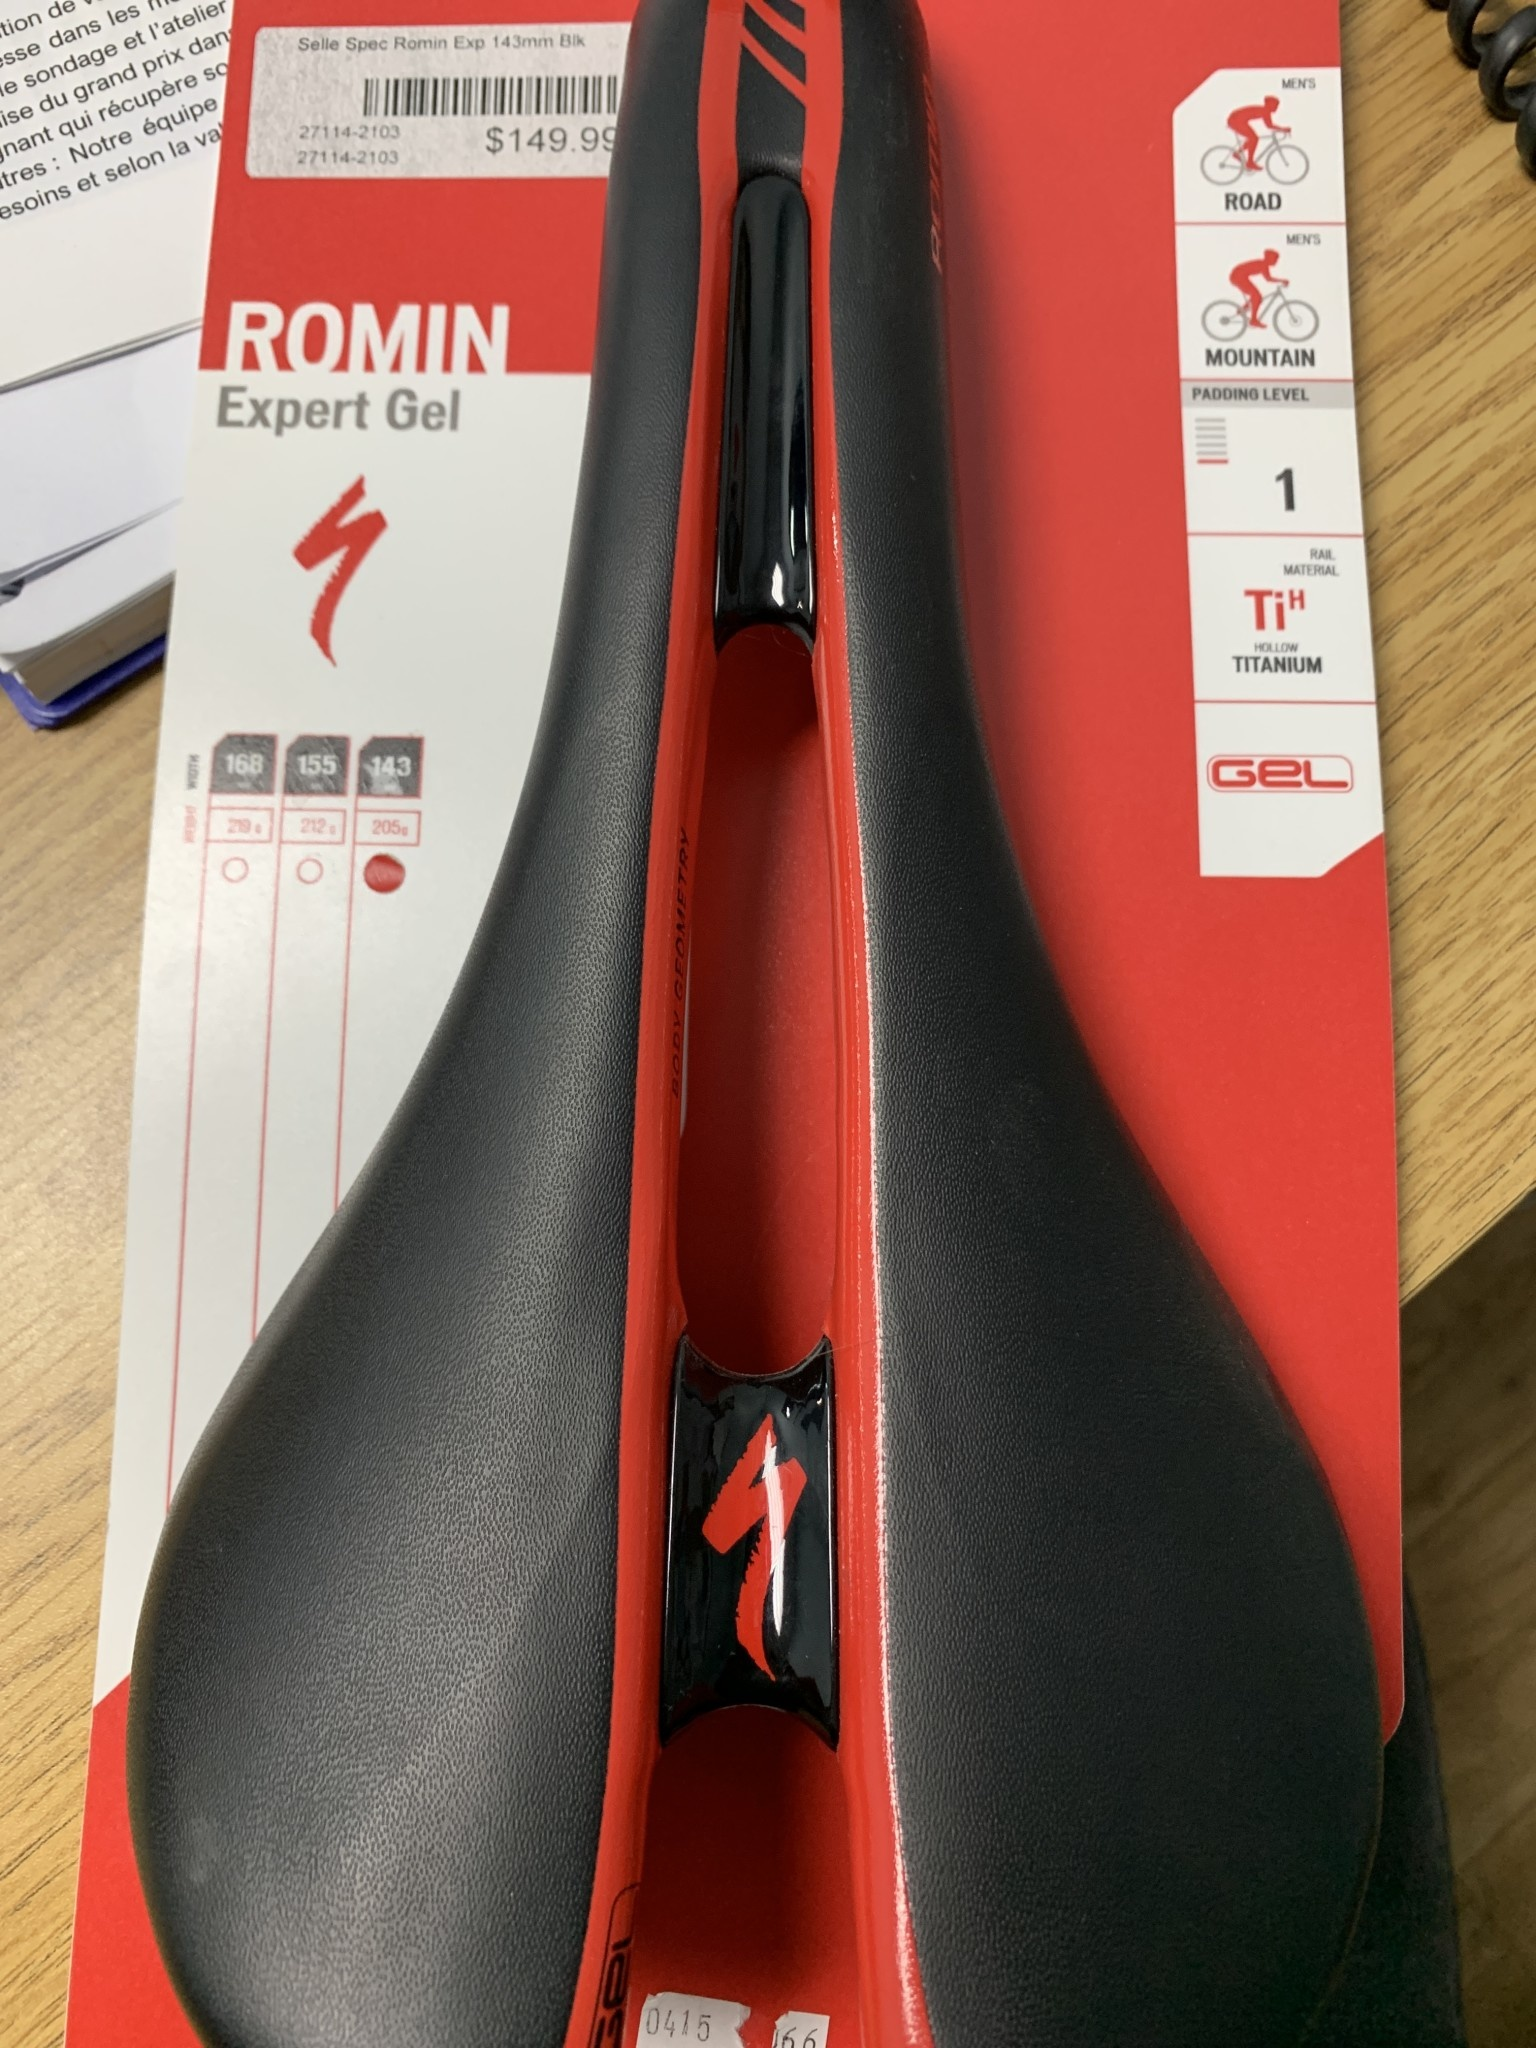 ROMIN EXPERT GEL SADDLE - Black 143-1